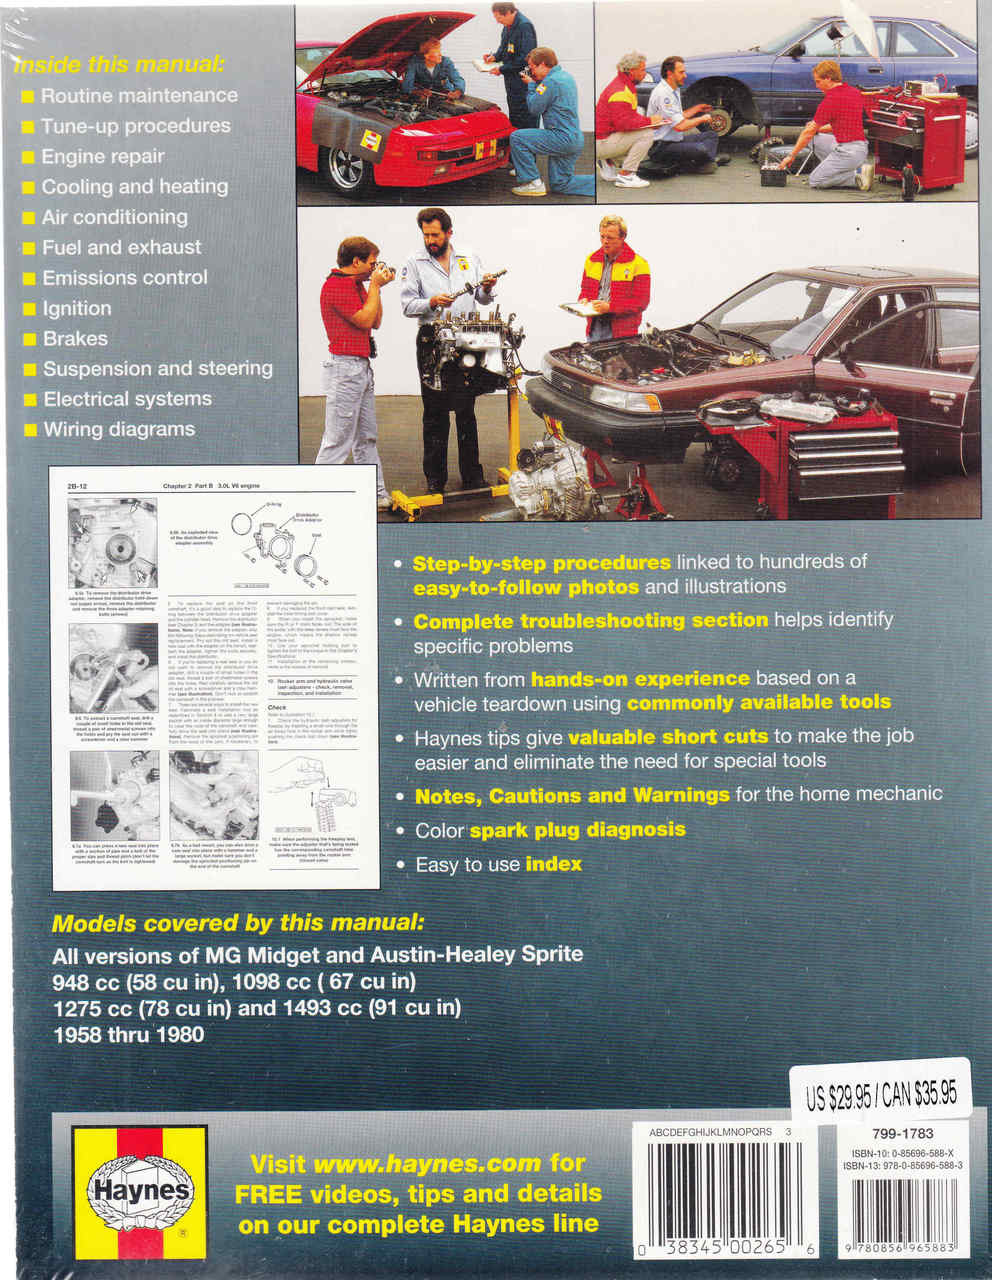 mg midget amp austin healey sprite 1958 1980 workshop manual  [ 992 x 1280 Pixel ]